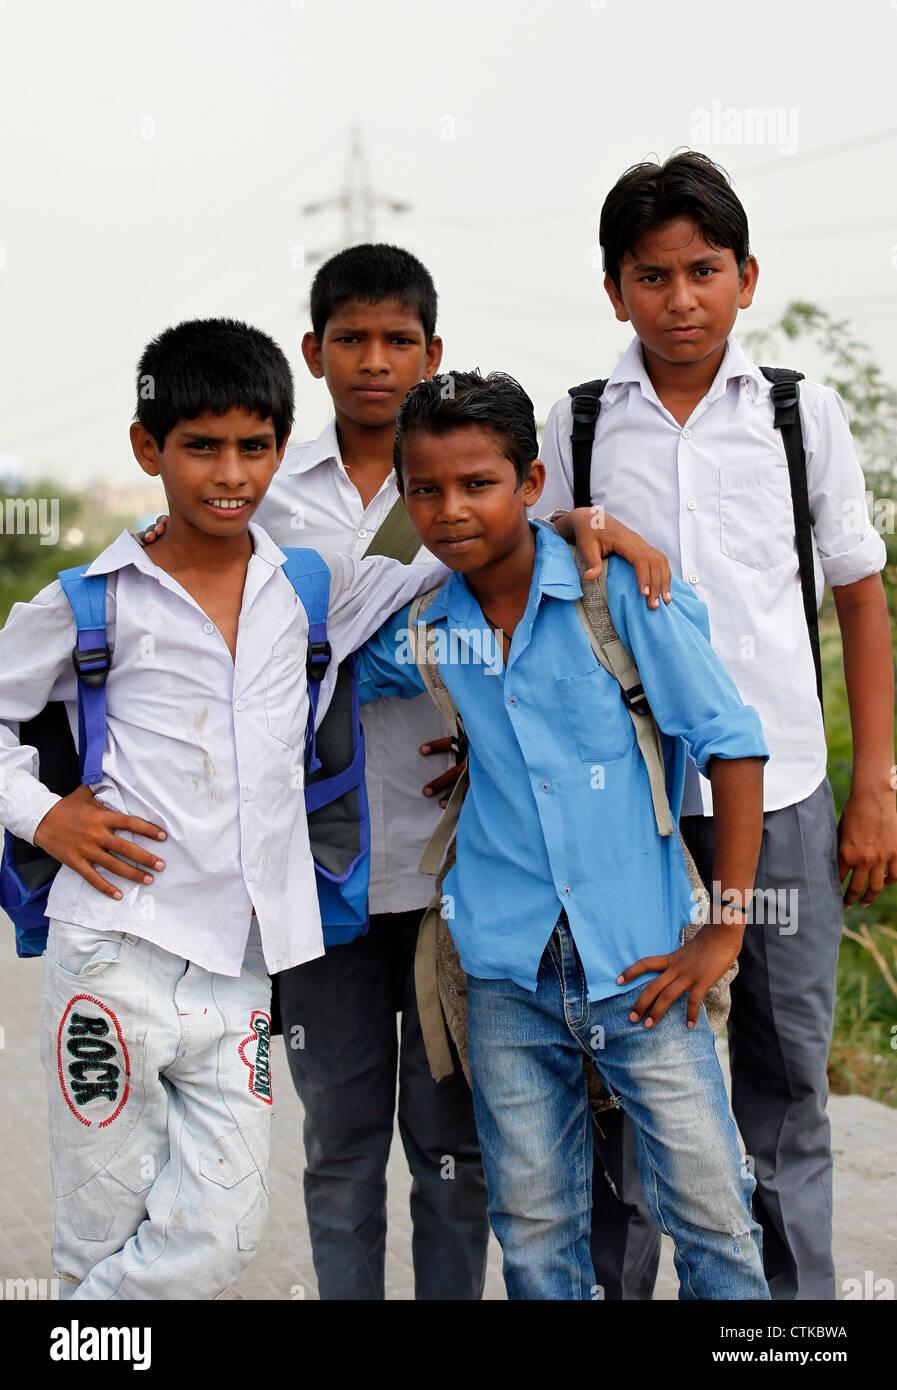 Traditionally Indian,School Boys,Student,Dress,Uniform,Bag ...